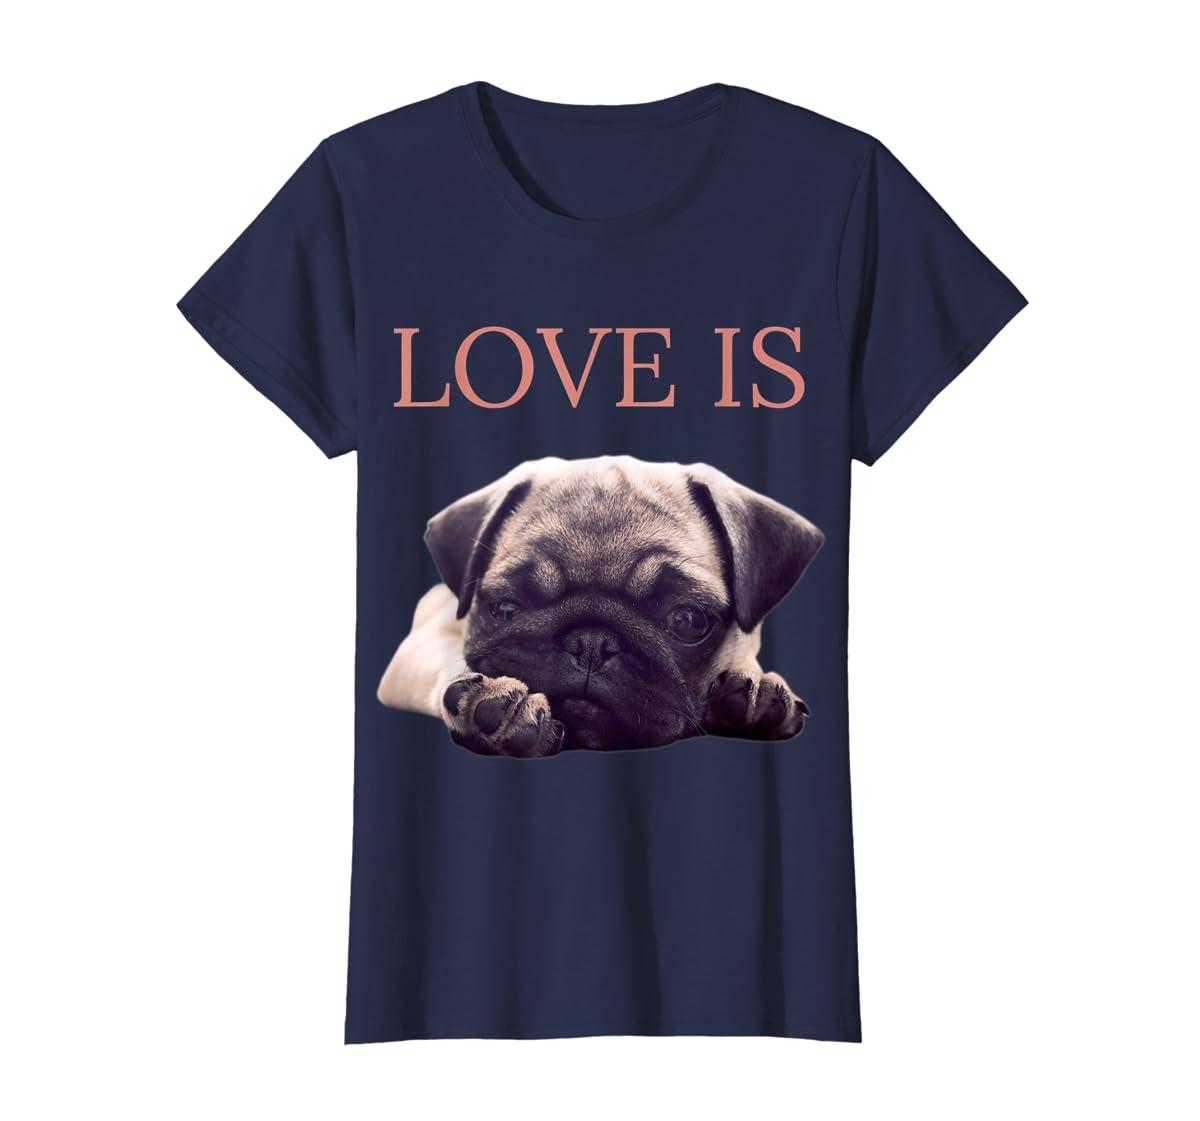 Mothers Day Pug Shirt Women Men Pug Mom Life Tee Love Is Dog-Women's T-Shirt-Navy